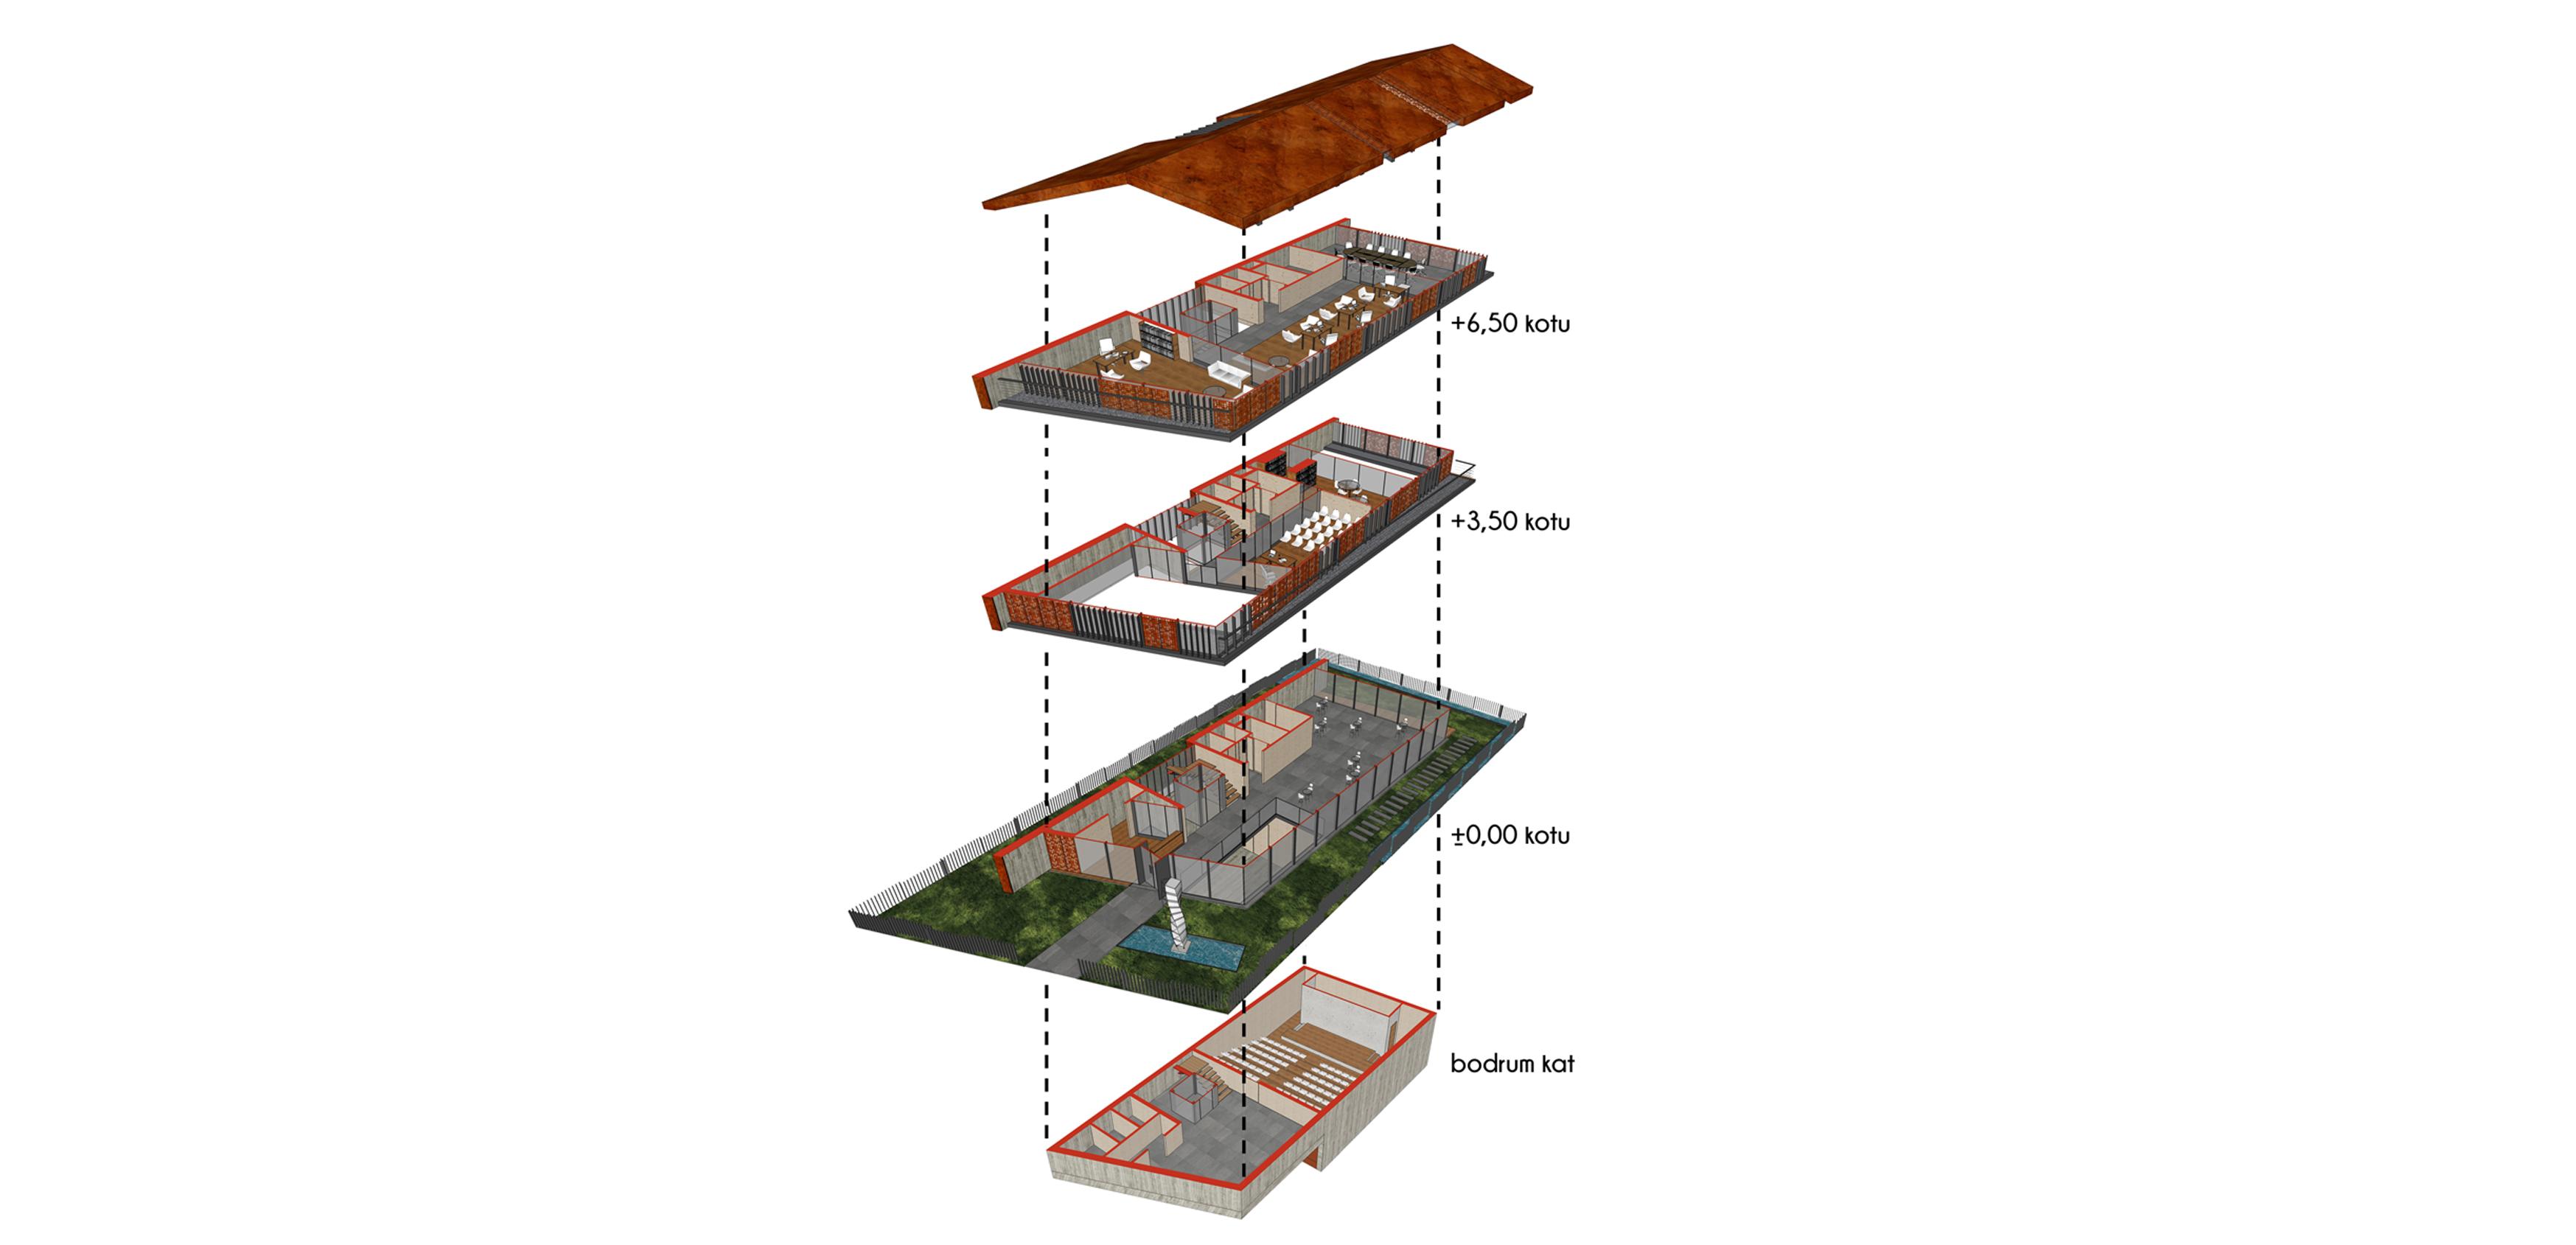 dodofis mimarlık ofisi  denizli mimarlar odası binası aksonometri Chamber Of Architects